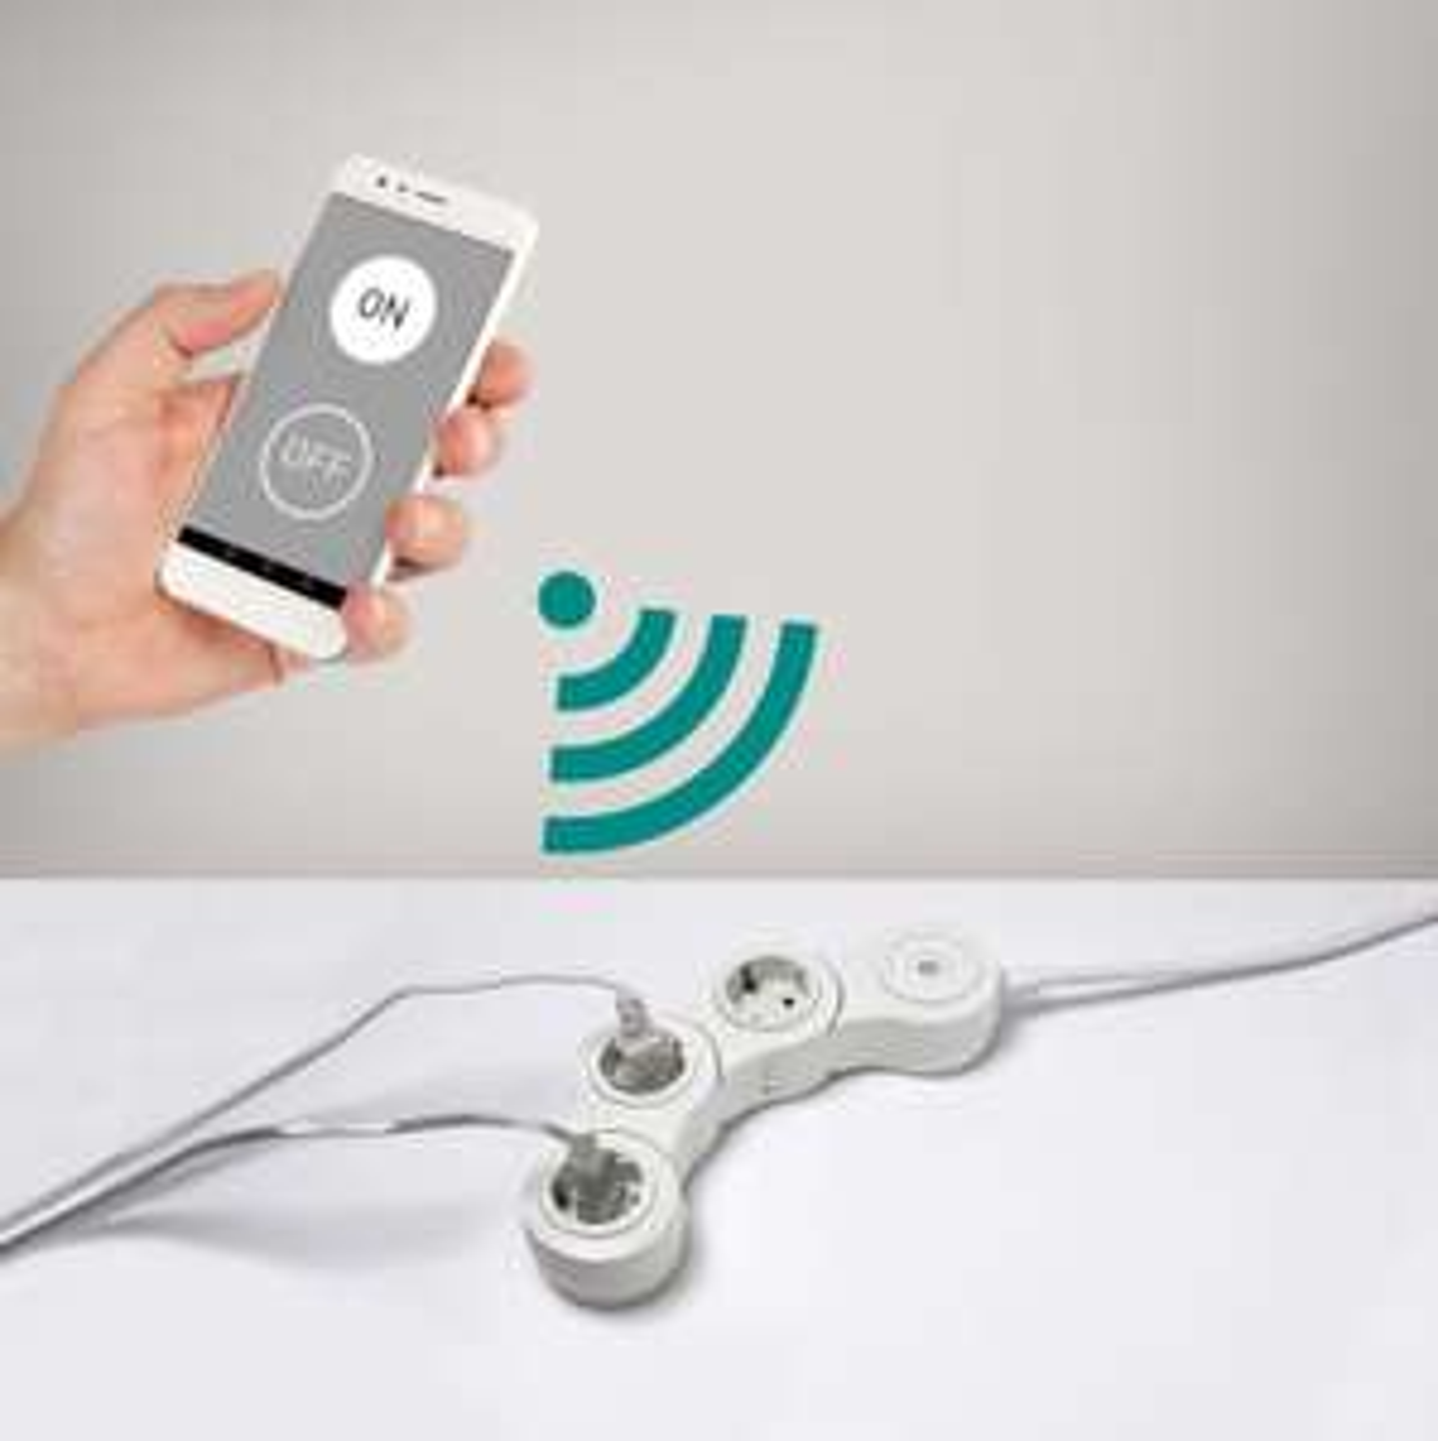 WLAN Steckdosenleiste 3-fach, flexibel, Flachstecker, Alexa/Google Home-kompatibel